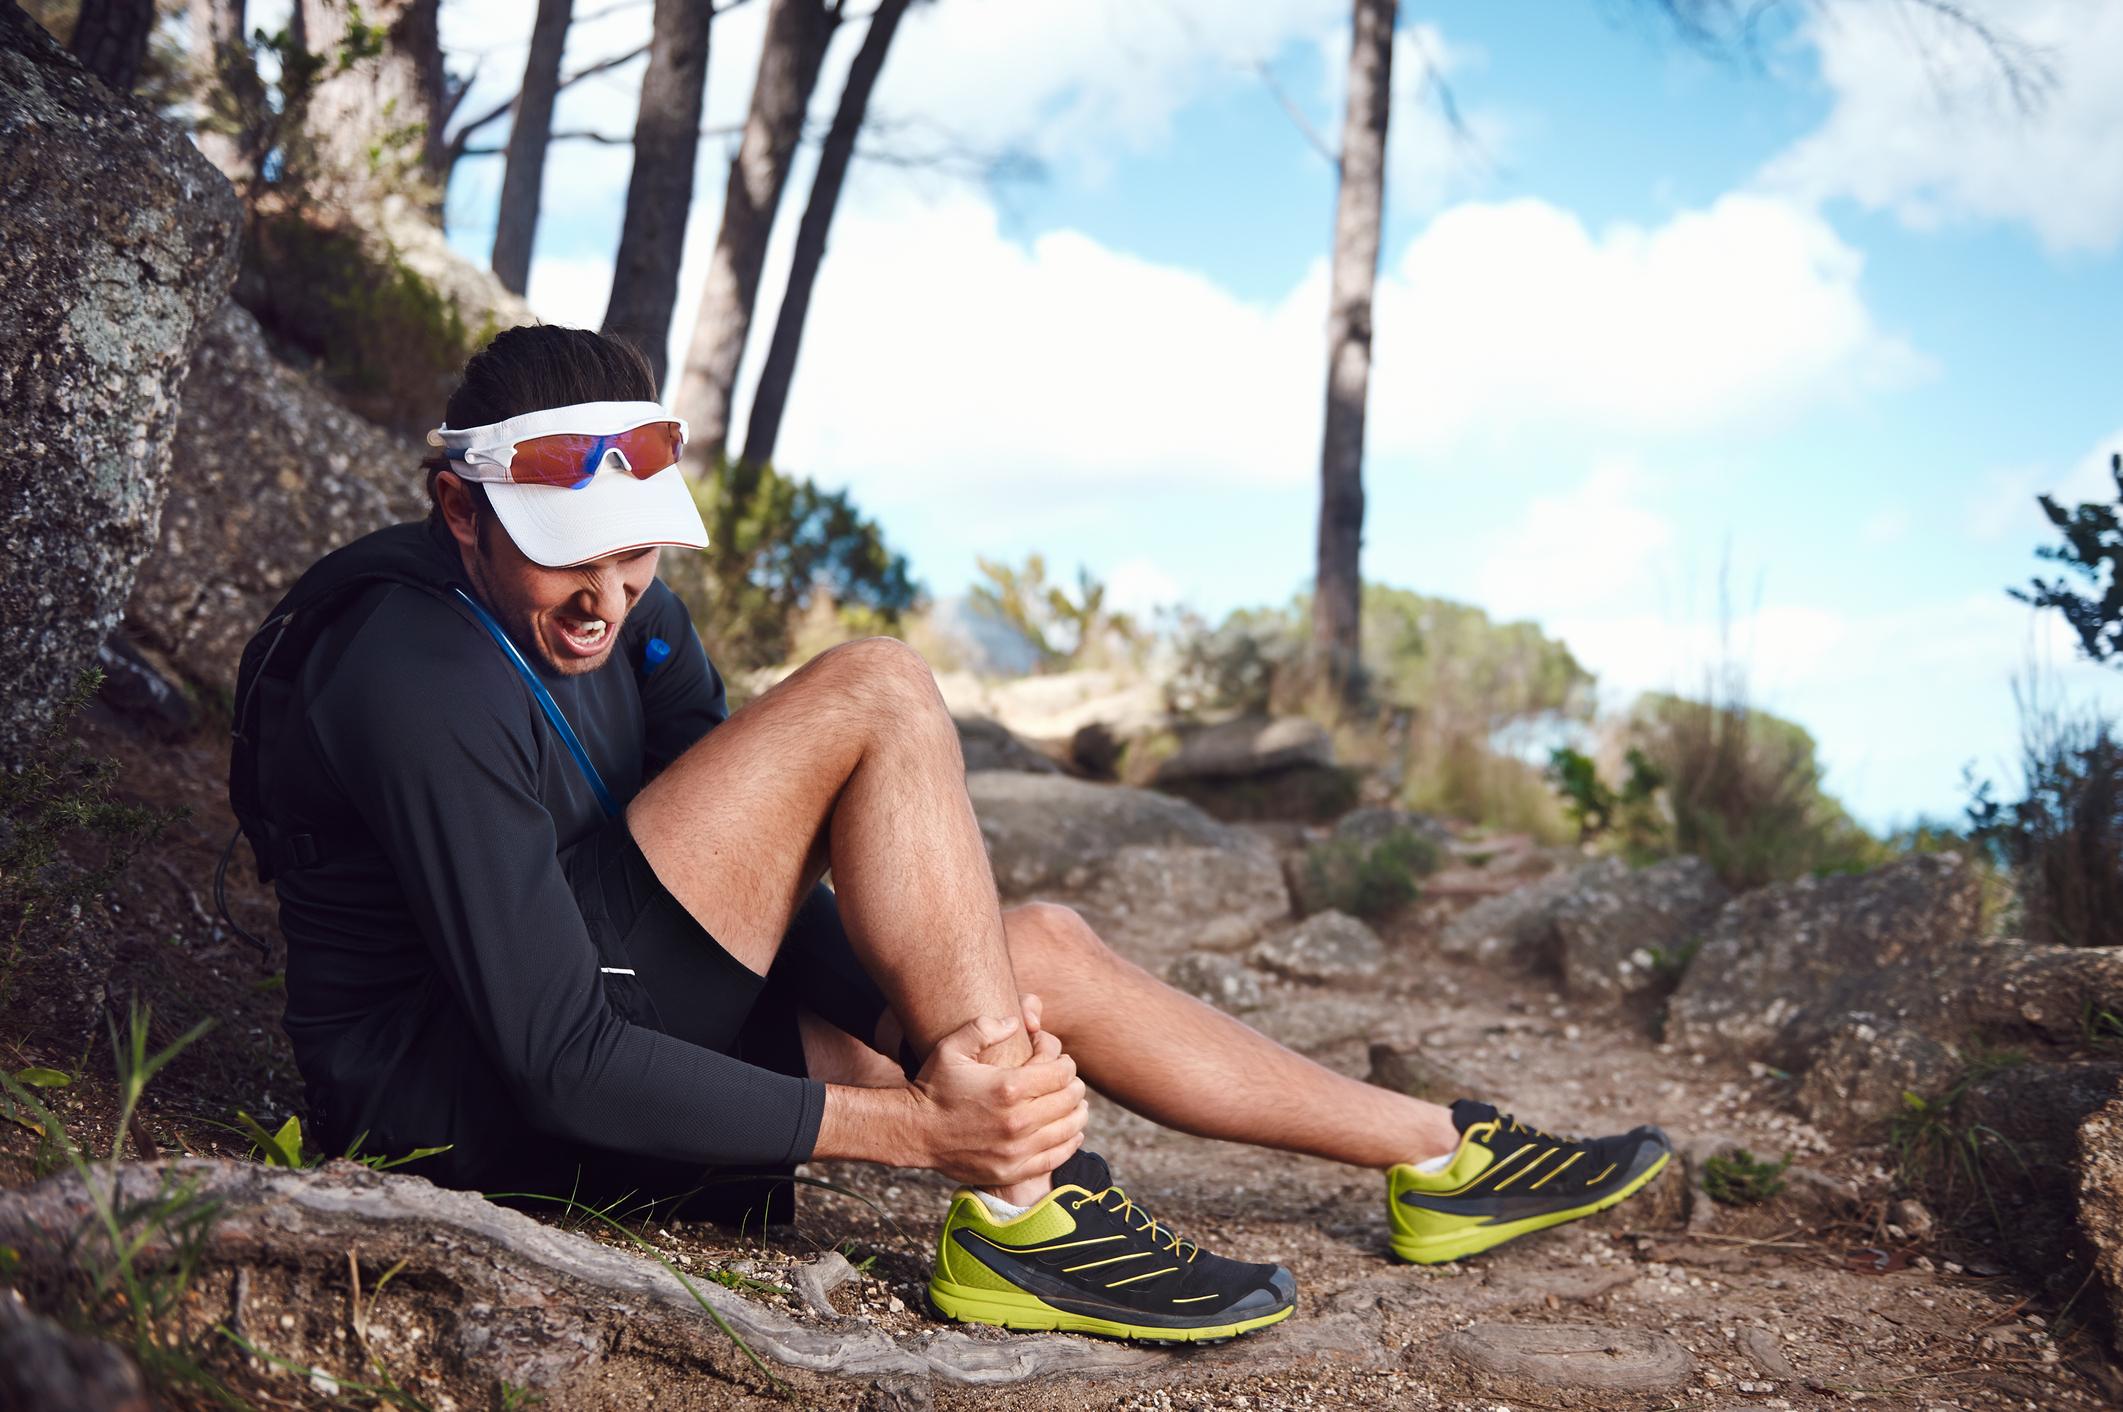 Shin splints or a stress fracture? Understanding the leg pain that you get when running